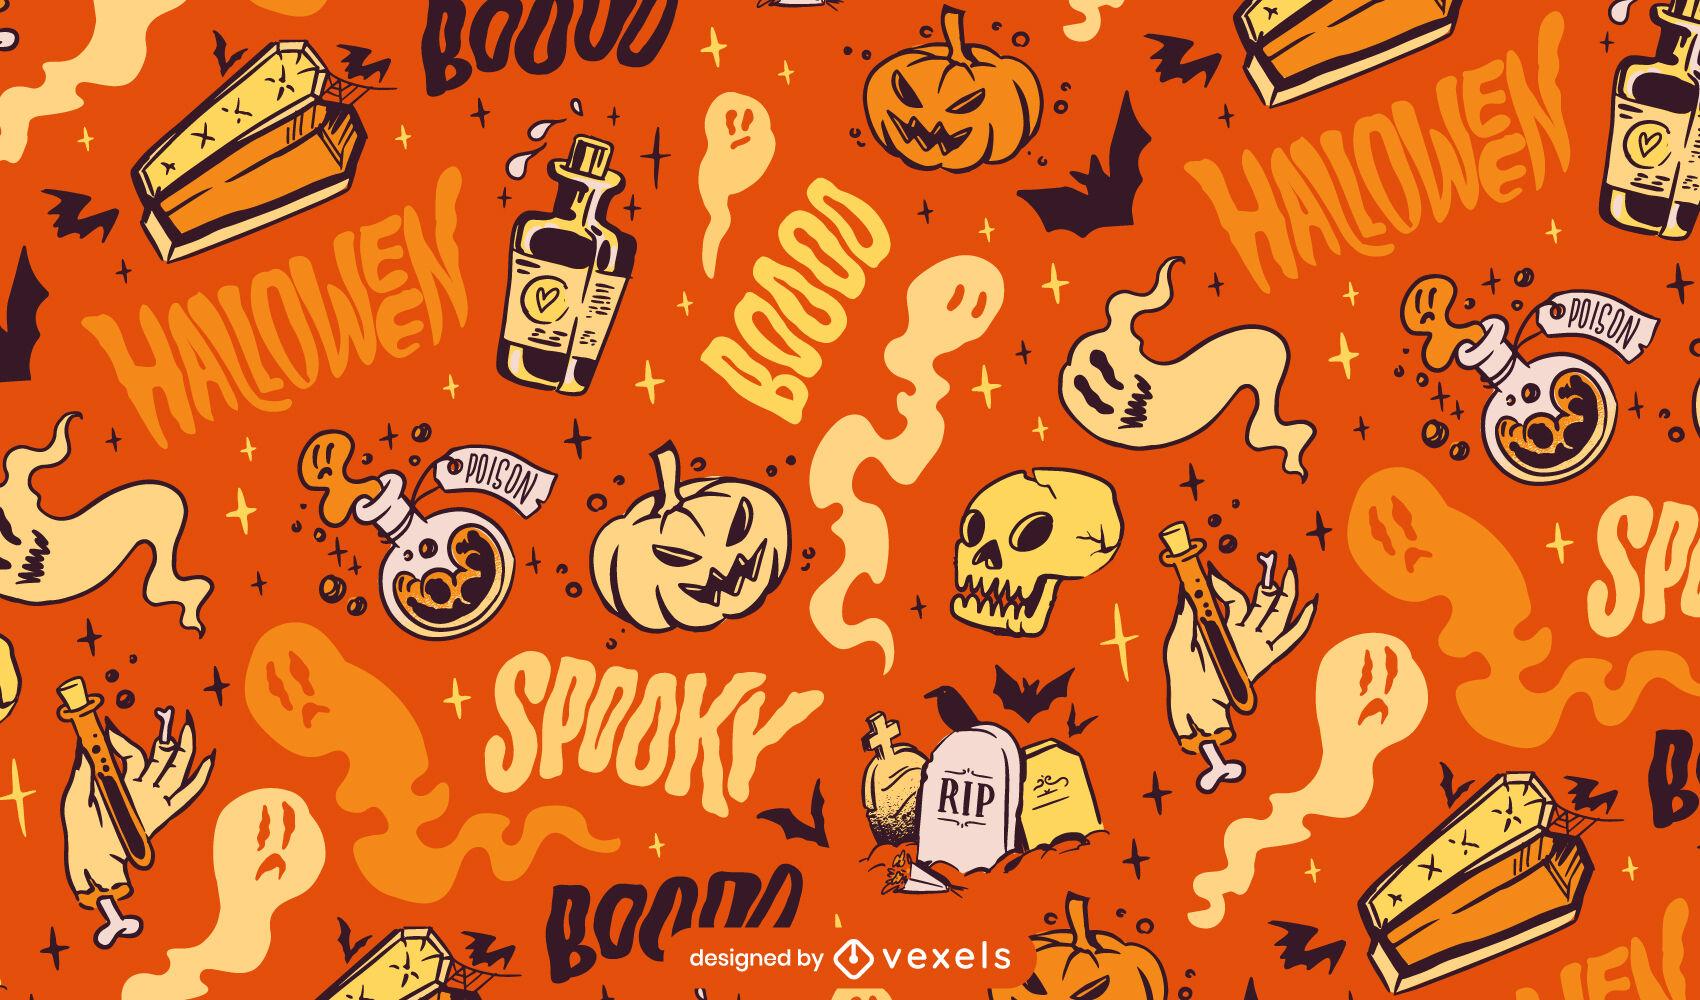 Halloween-Elemente Boo-Muster-Design